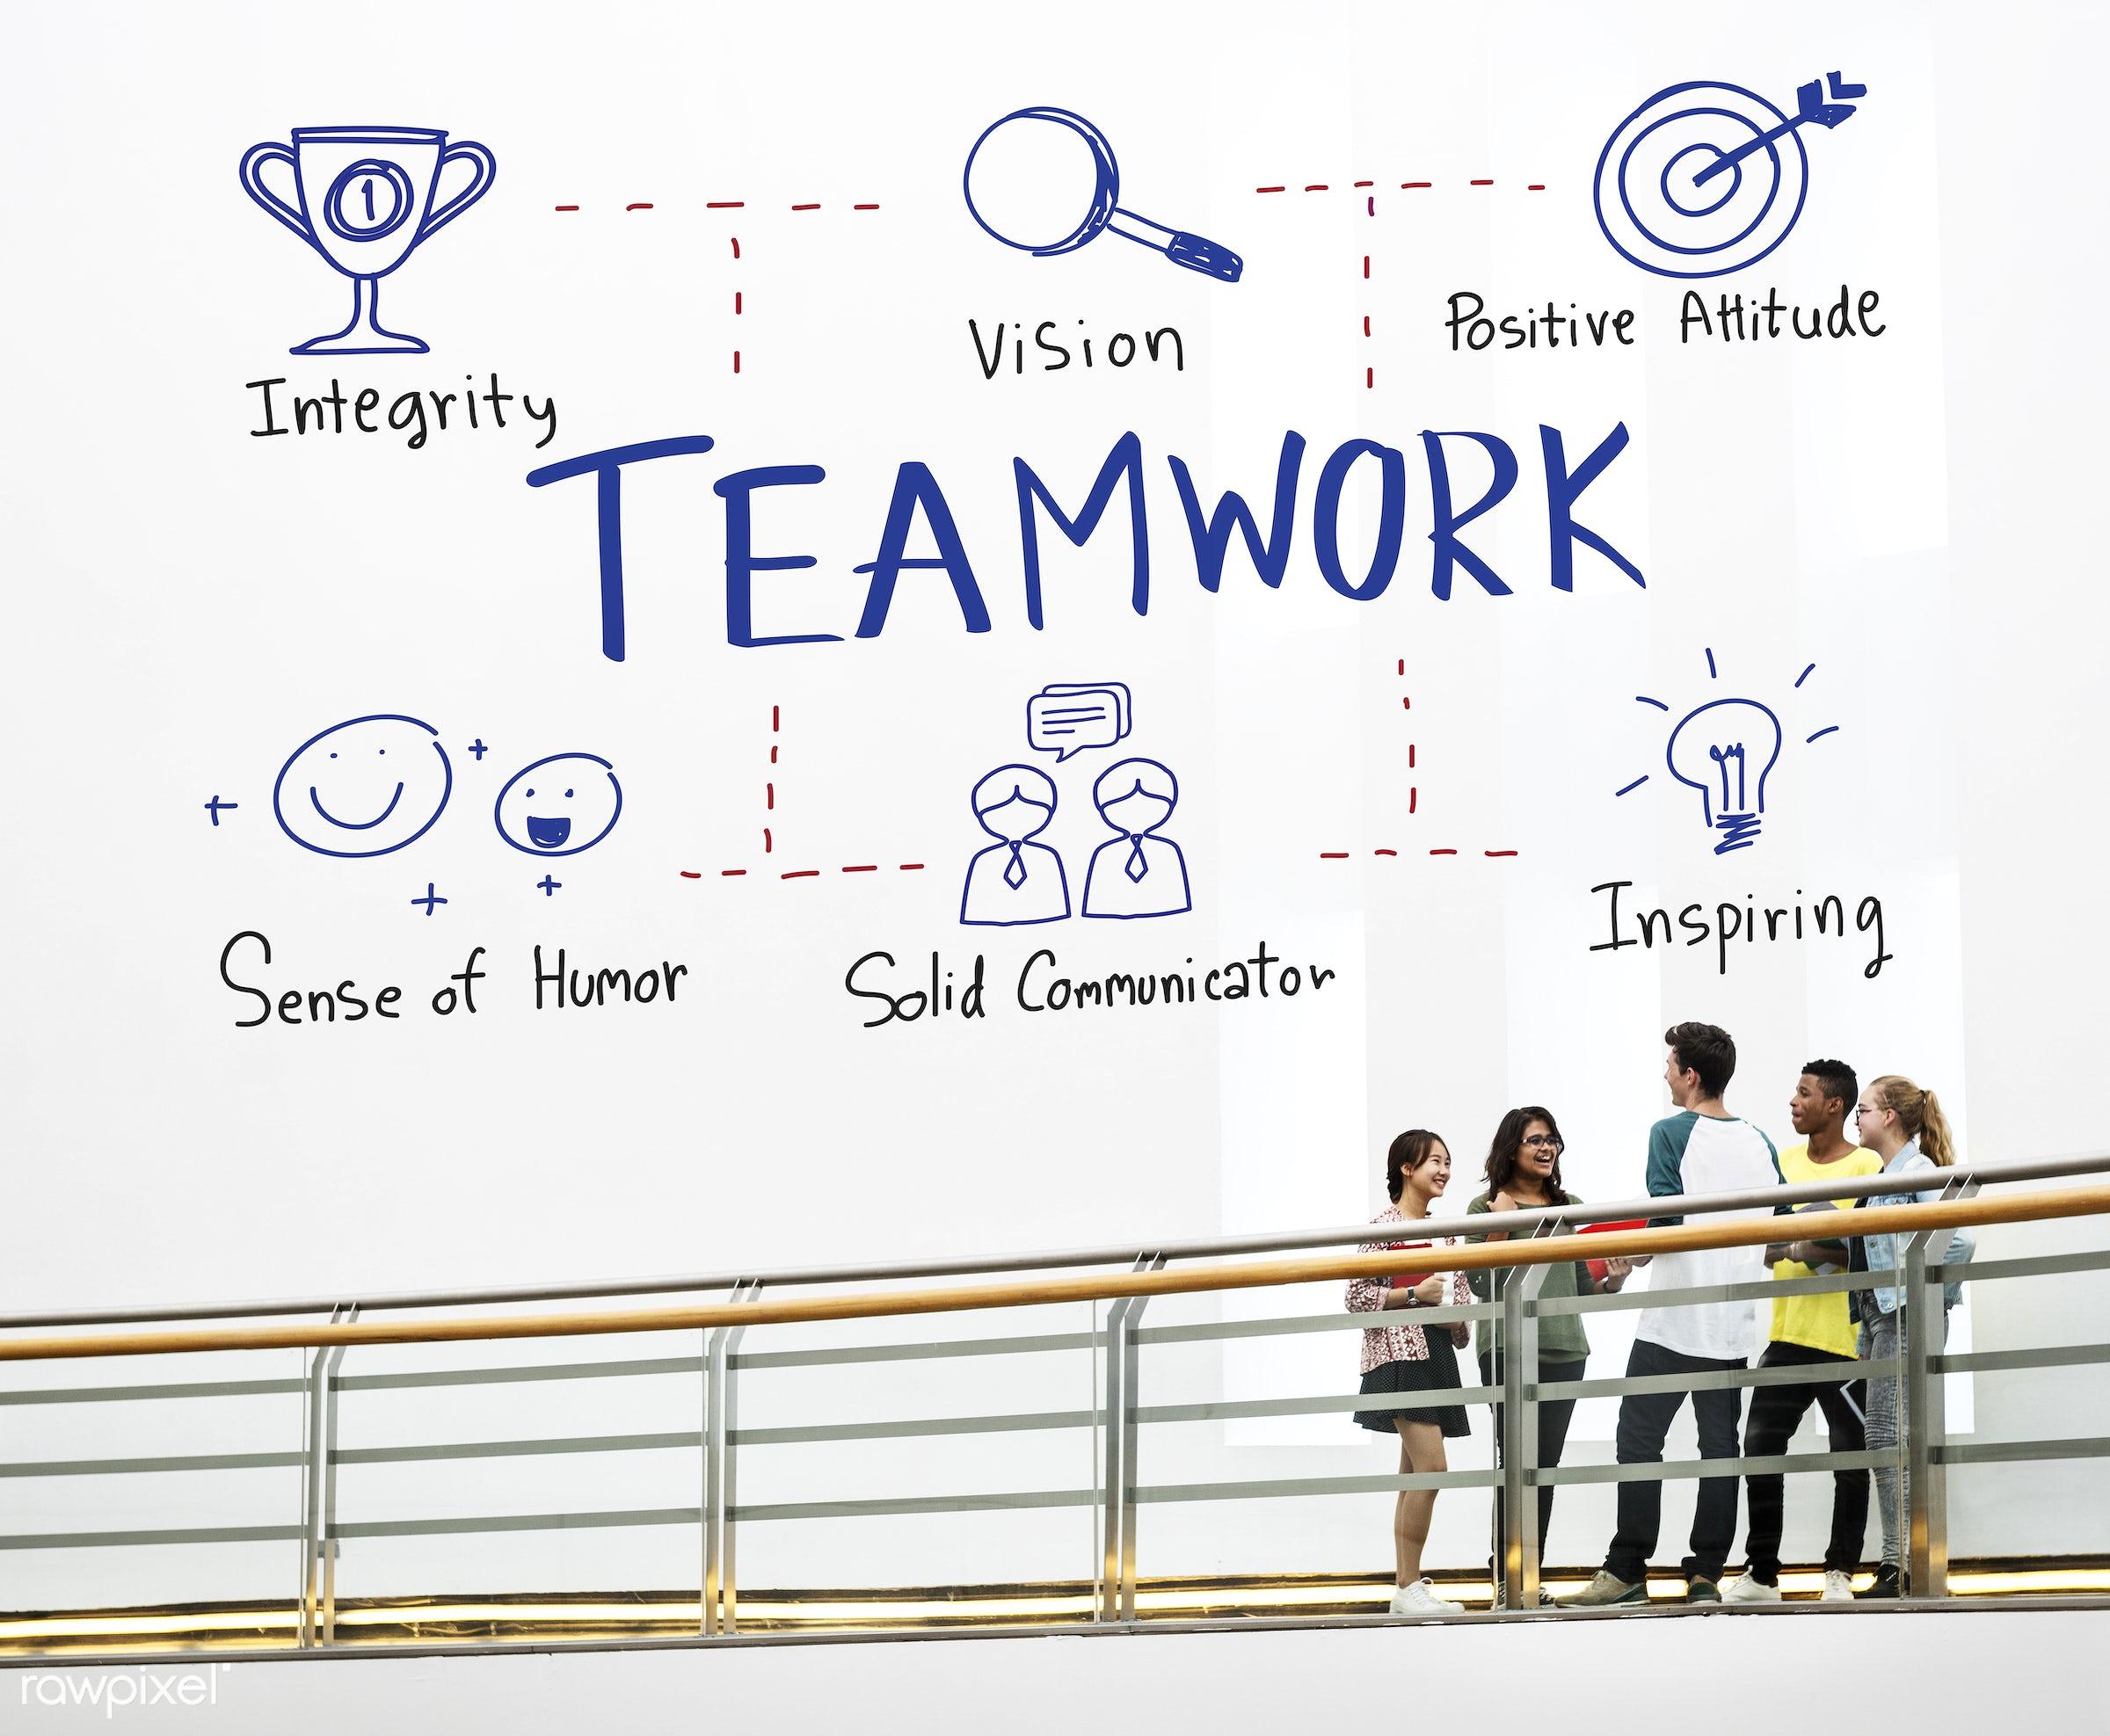 carrying, attitude, book, books, boy, brainstorming, bridge, business, communication, company, creative, creativity, friends...